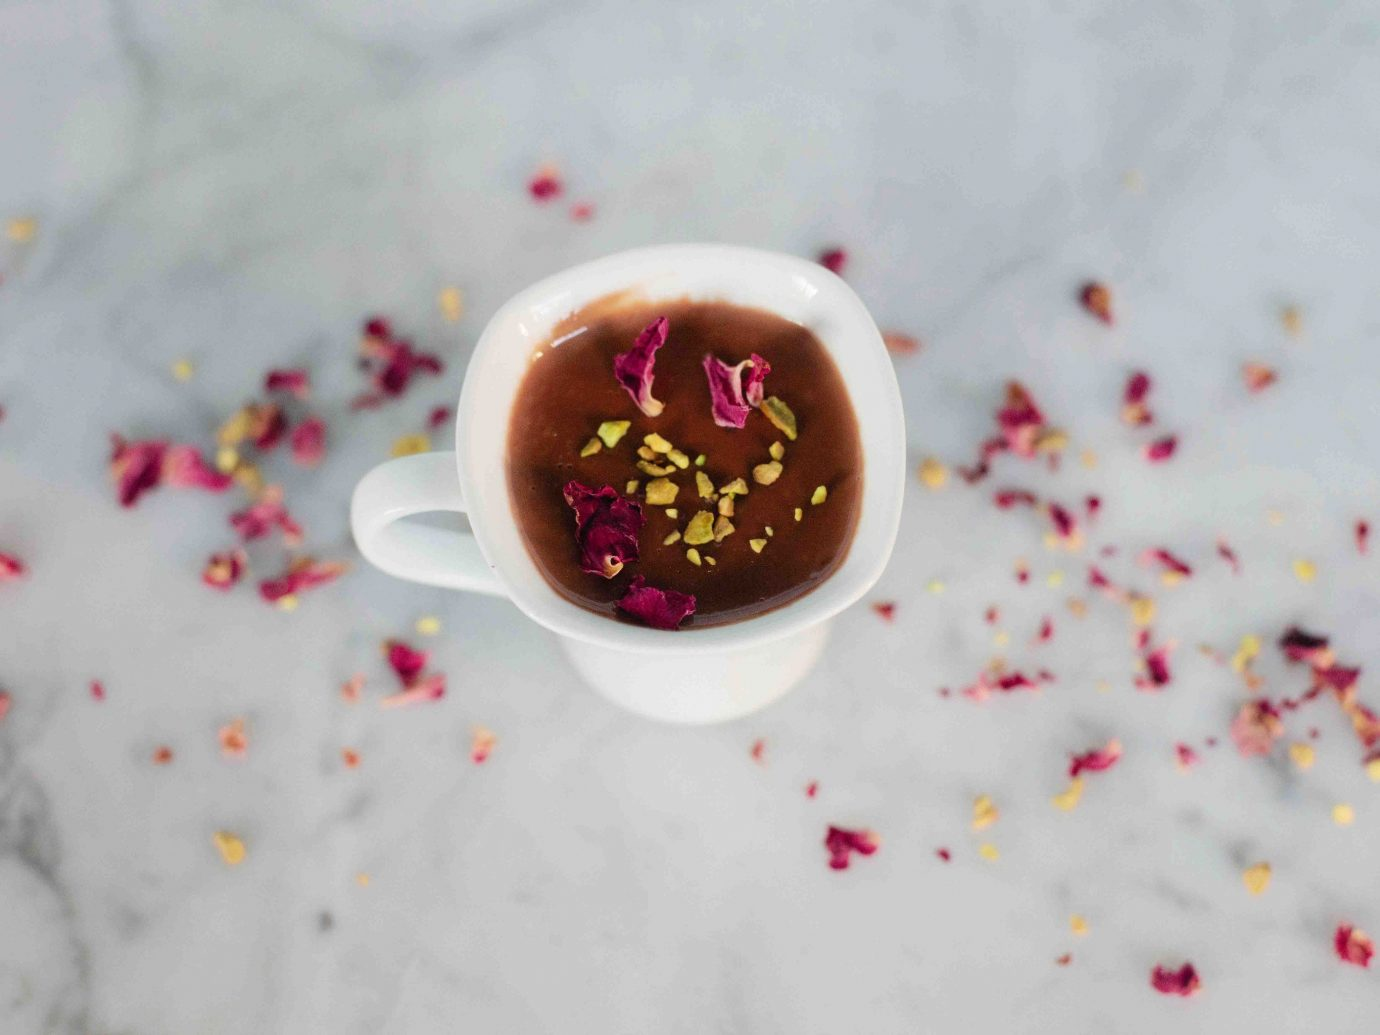 Food + Drink indoor food red pink petal cloth dessert produce sweetness heart flavor flower tableware